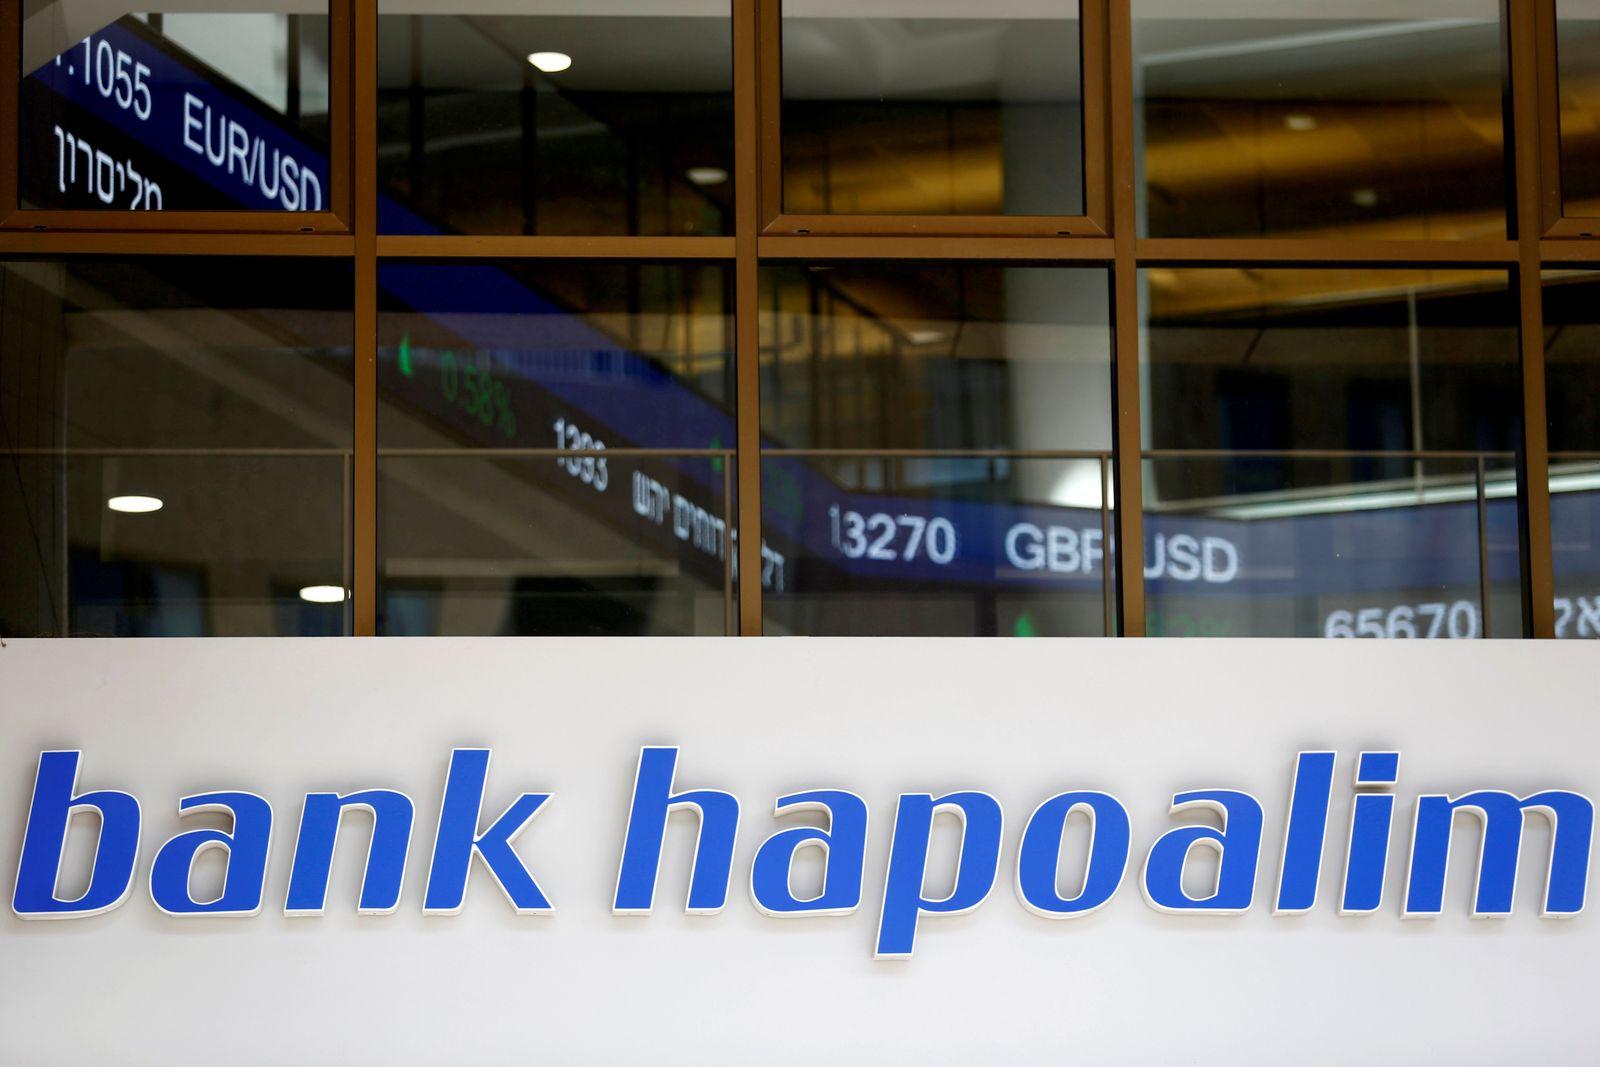 FILE PHOTO: The logo of Bank Hapoalim, Israel's biggest bank, is seen at their main branch in Tel Aviv, Israel